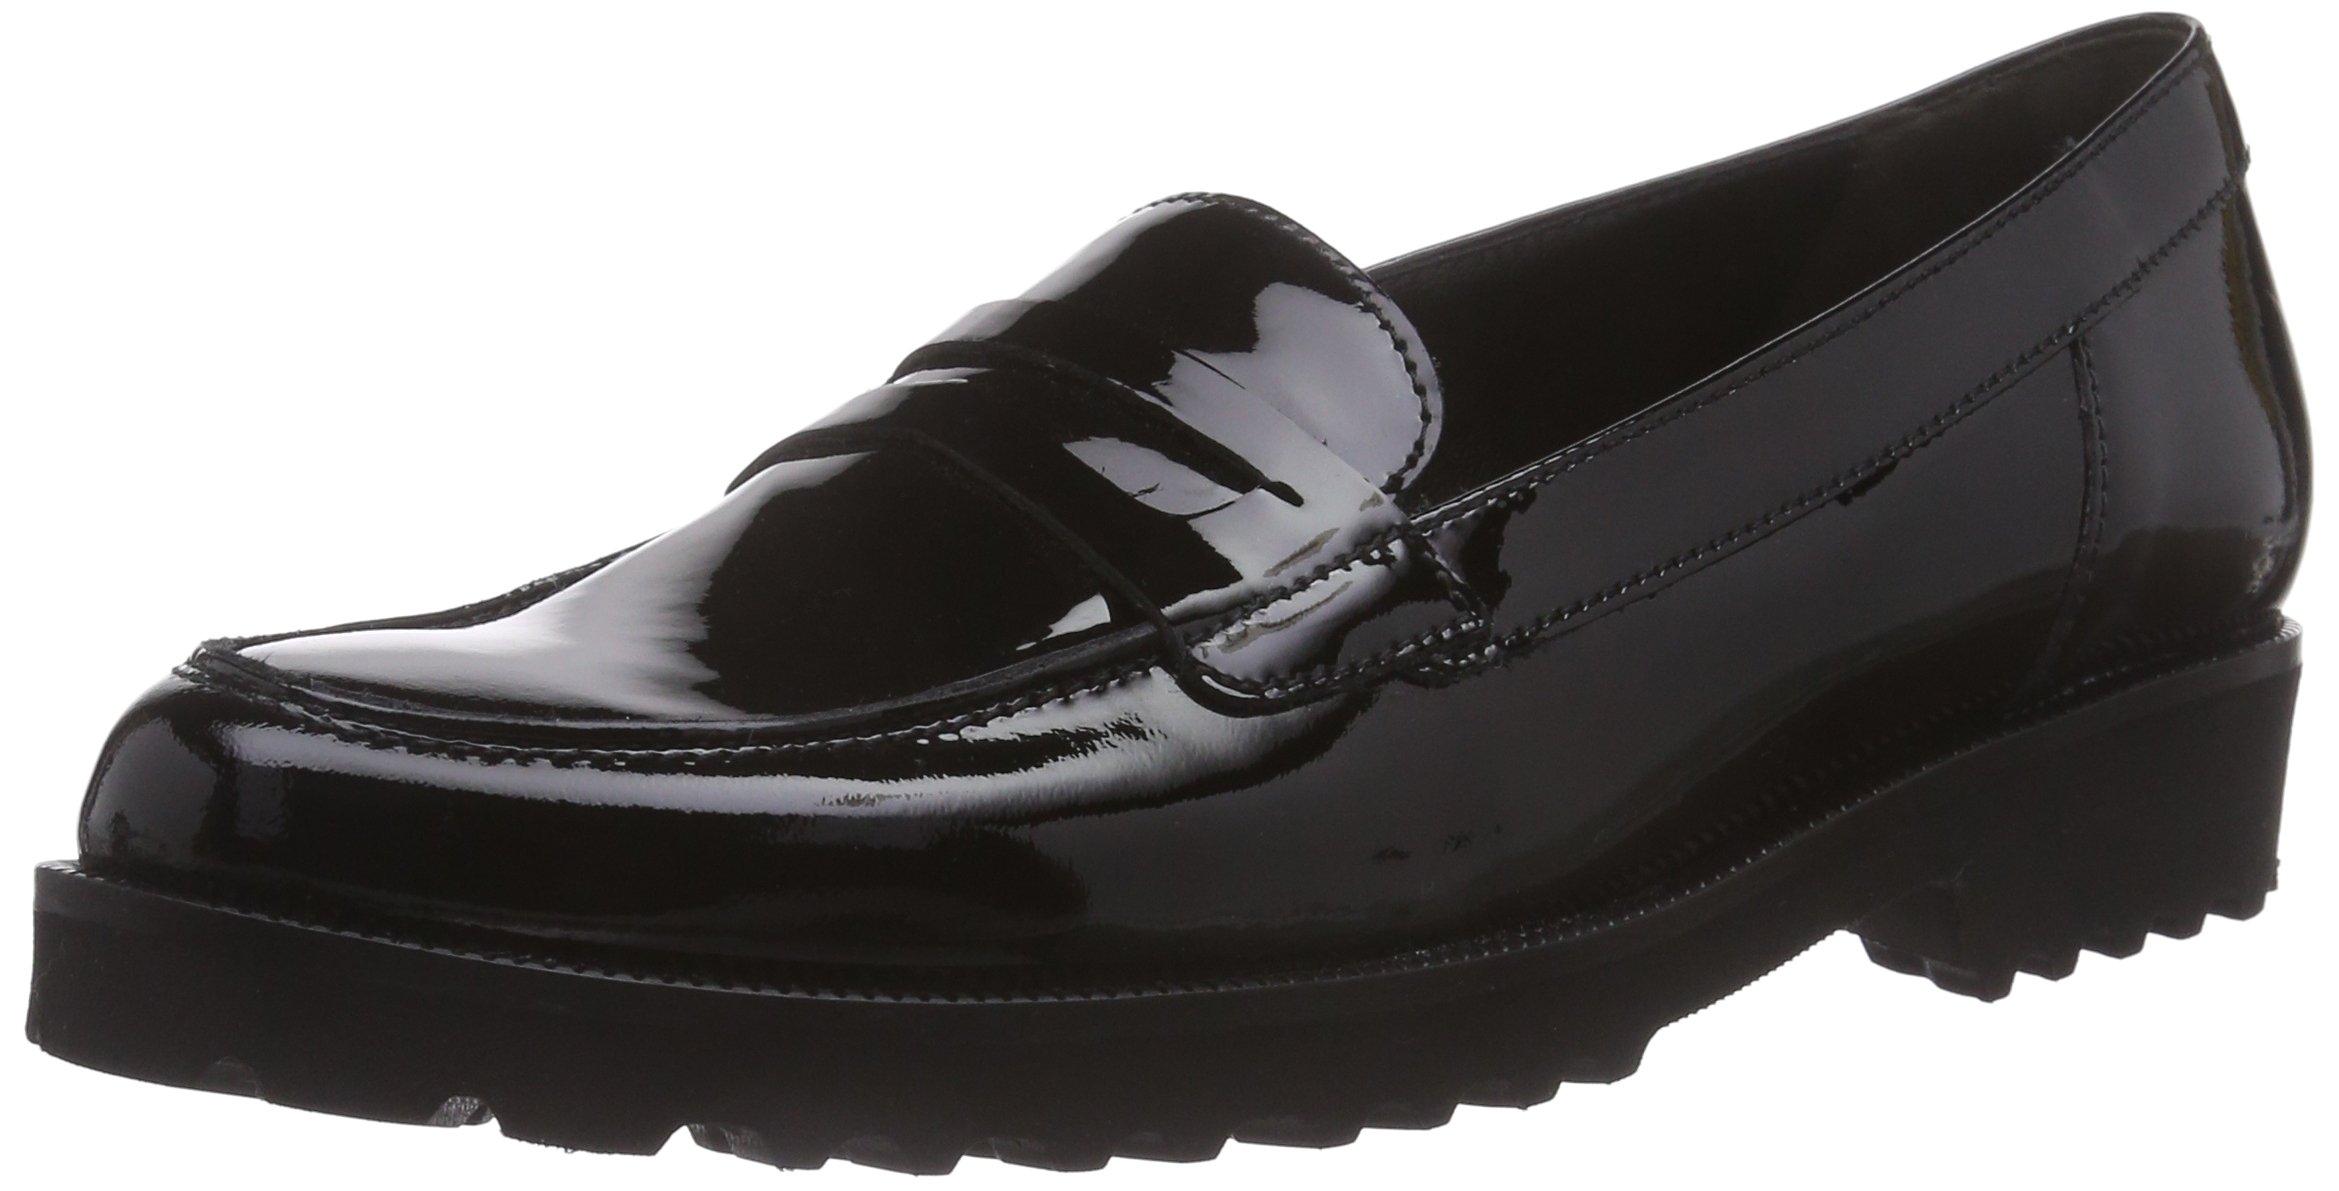 Mocassins 413 Gabor Fashion FemmeNoirschwarz Eu Shoes 31 9740 5 hotQrsdCxB